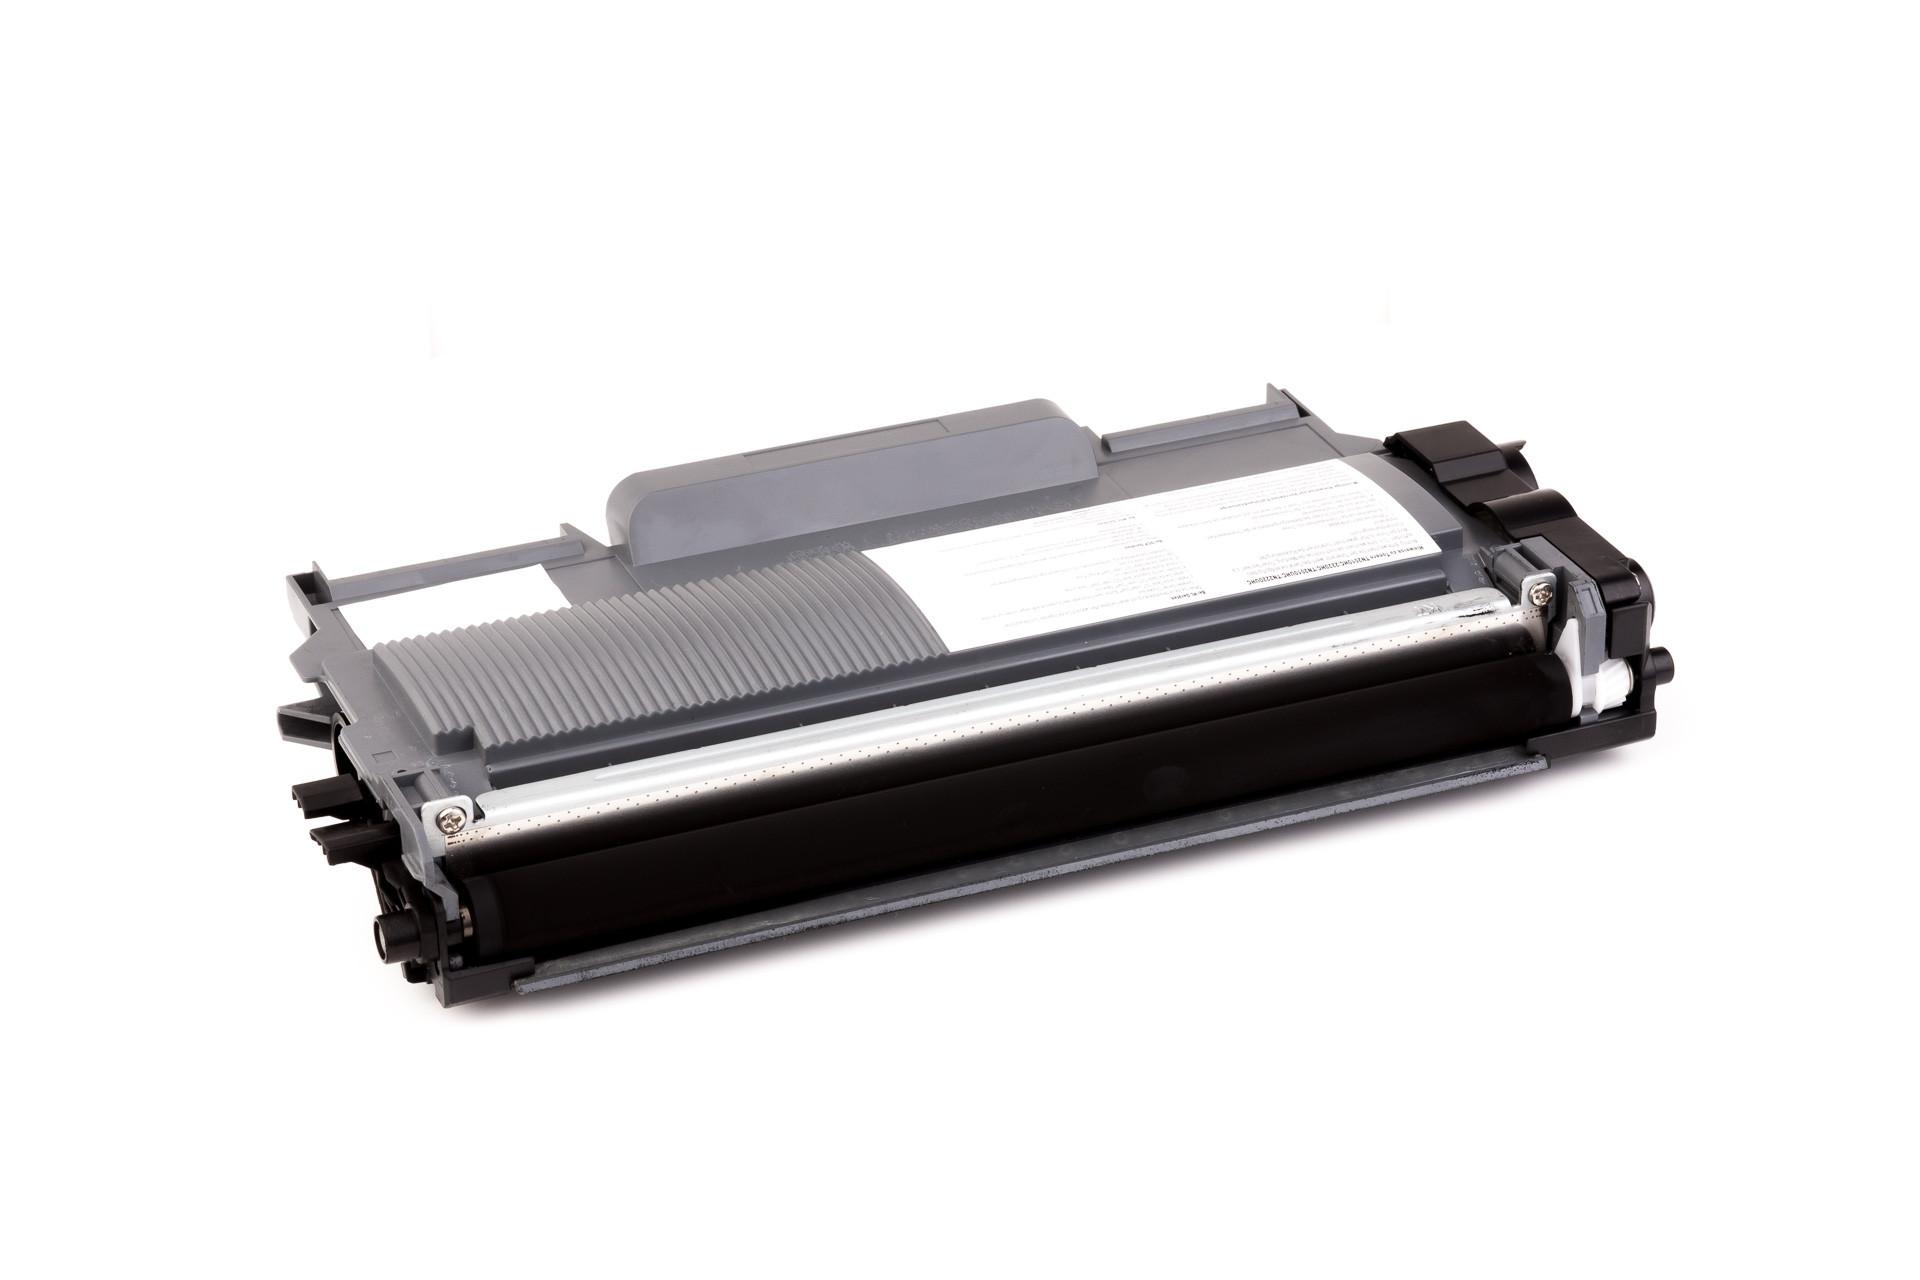 Cartouche de toner (alternatif) compatible à Brother HL-2240/2240D/2250/2250DN/2270/2270DW/DCP-7060/7060D/7065/7065DN/7070/7070DW //  TN2220 / TN 2220